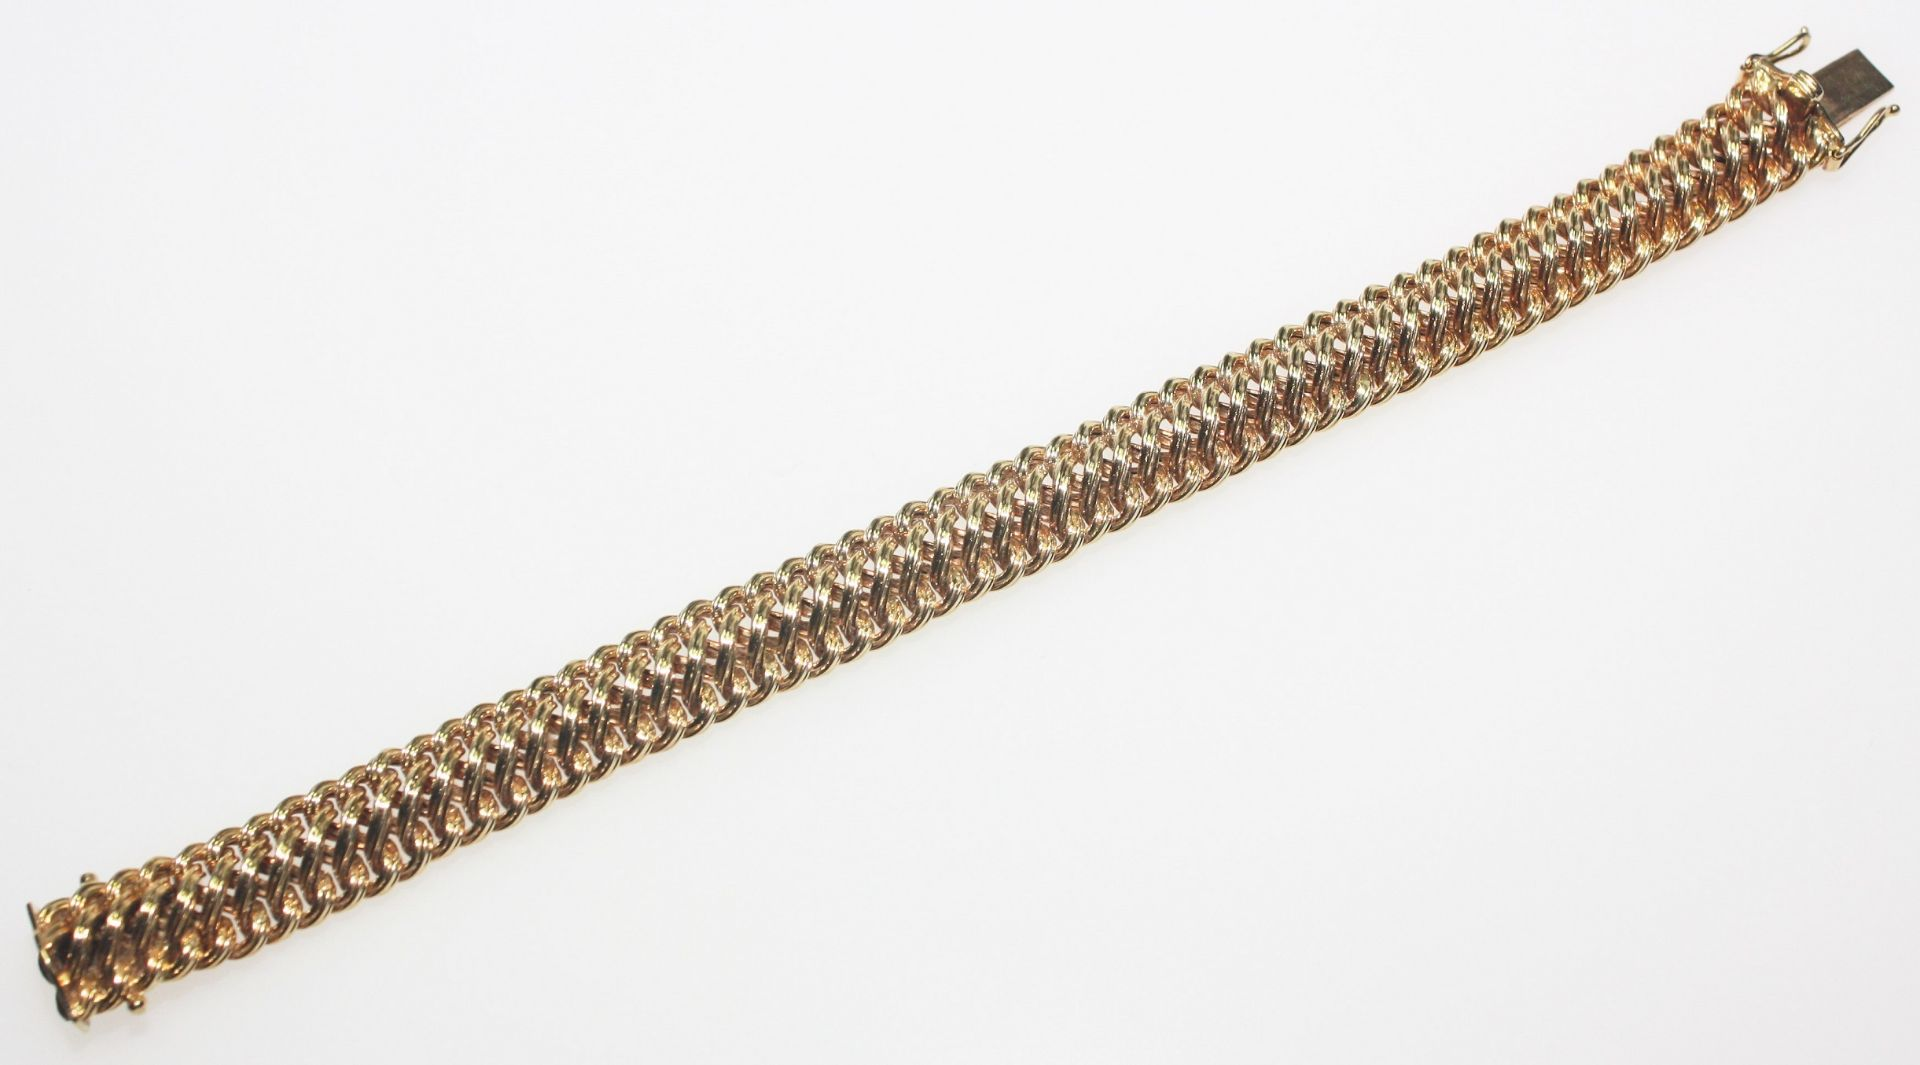 Los 36 - Goldenes Armband, leicht gewölbt 750/f gest., ca. 12 mm breit, 19 cm lang. Brgw. 30,5 g